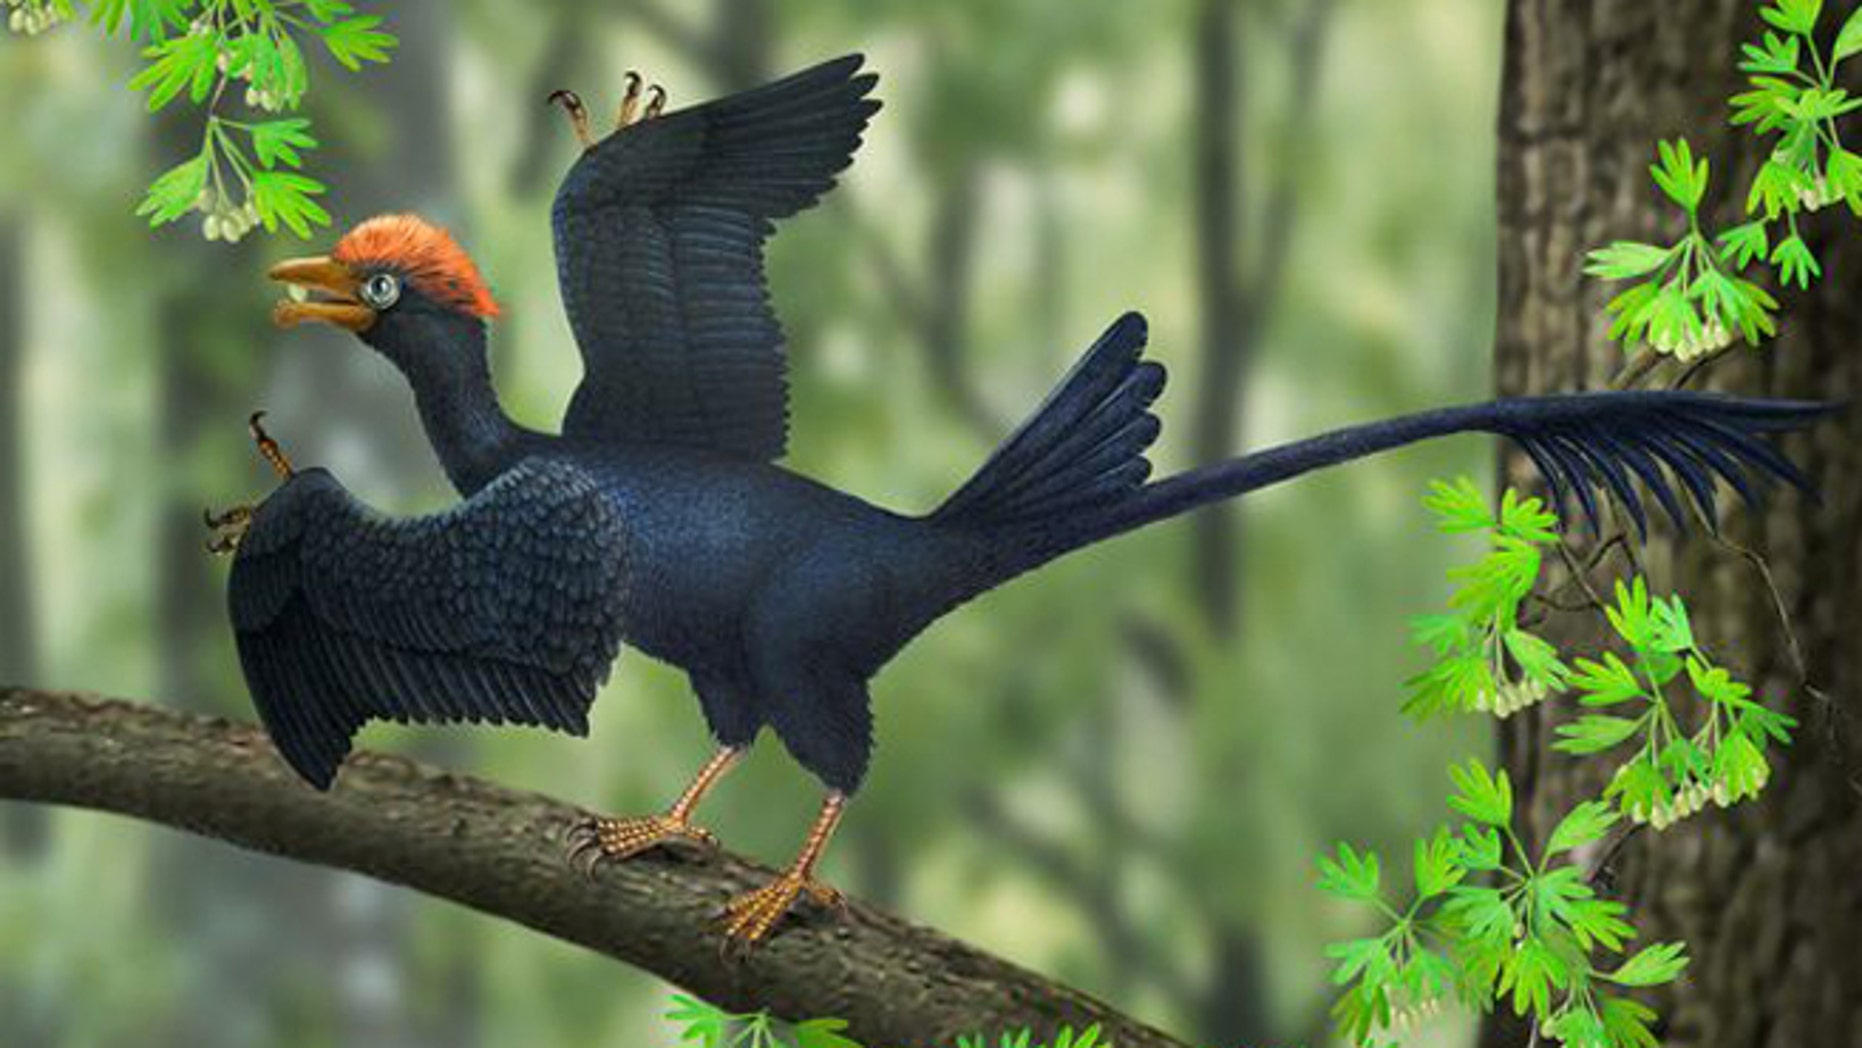 120-million-year-old bird had two tails   Fox News